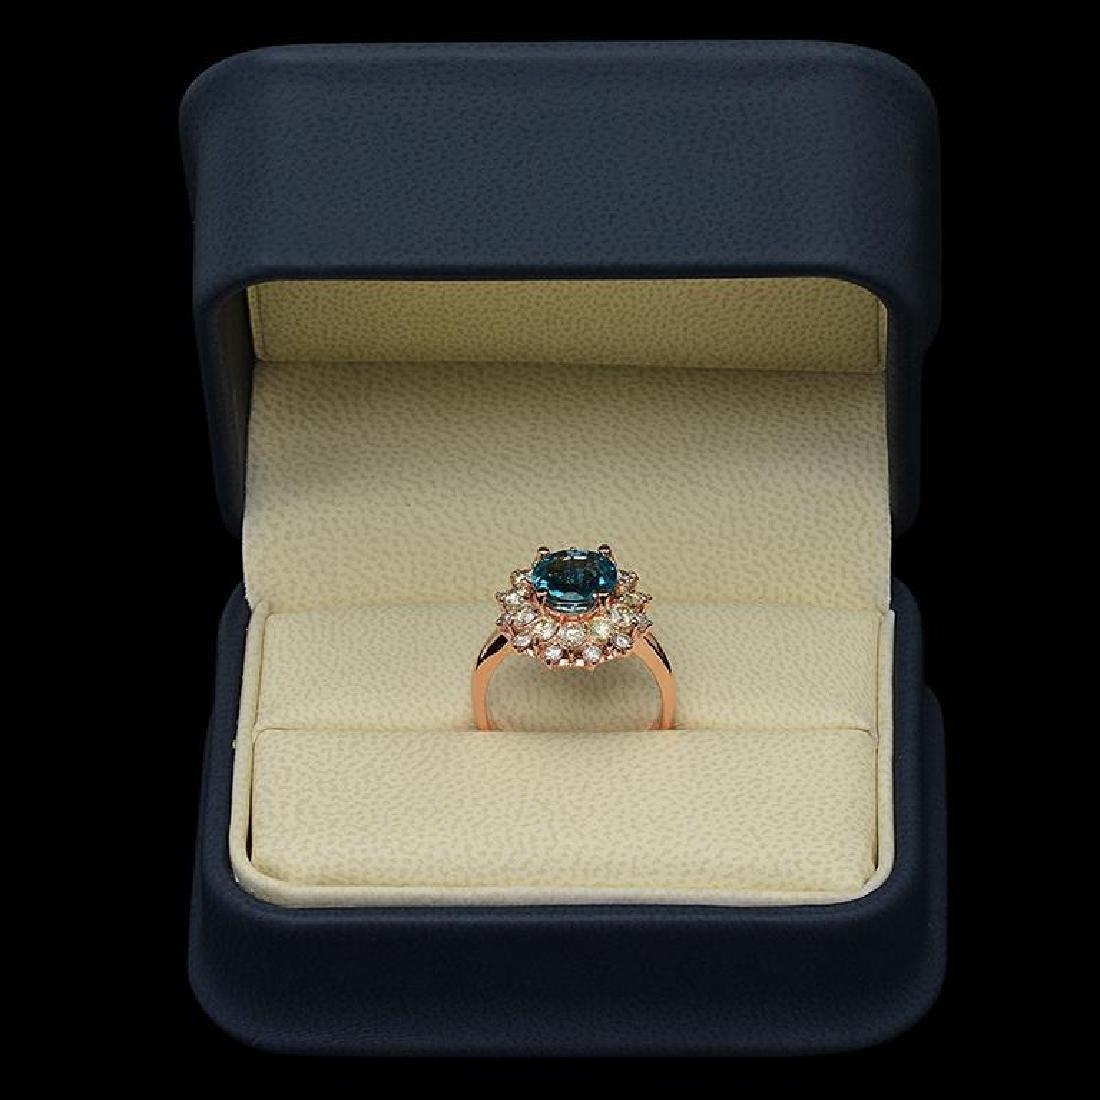 14k Gold 3.07ct Zircon & 1.51ct Diamond Ring - 3